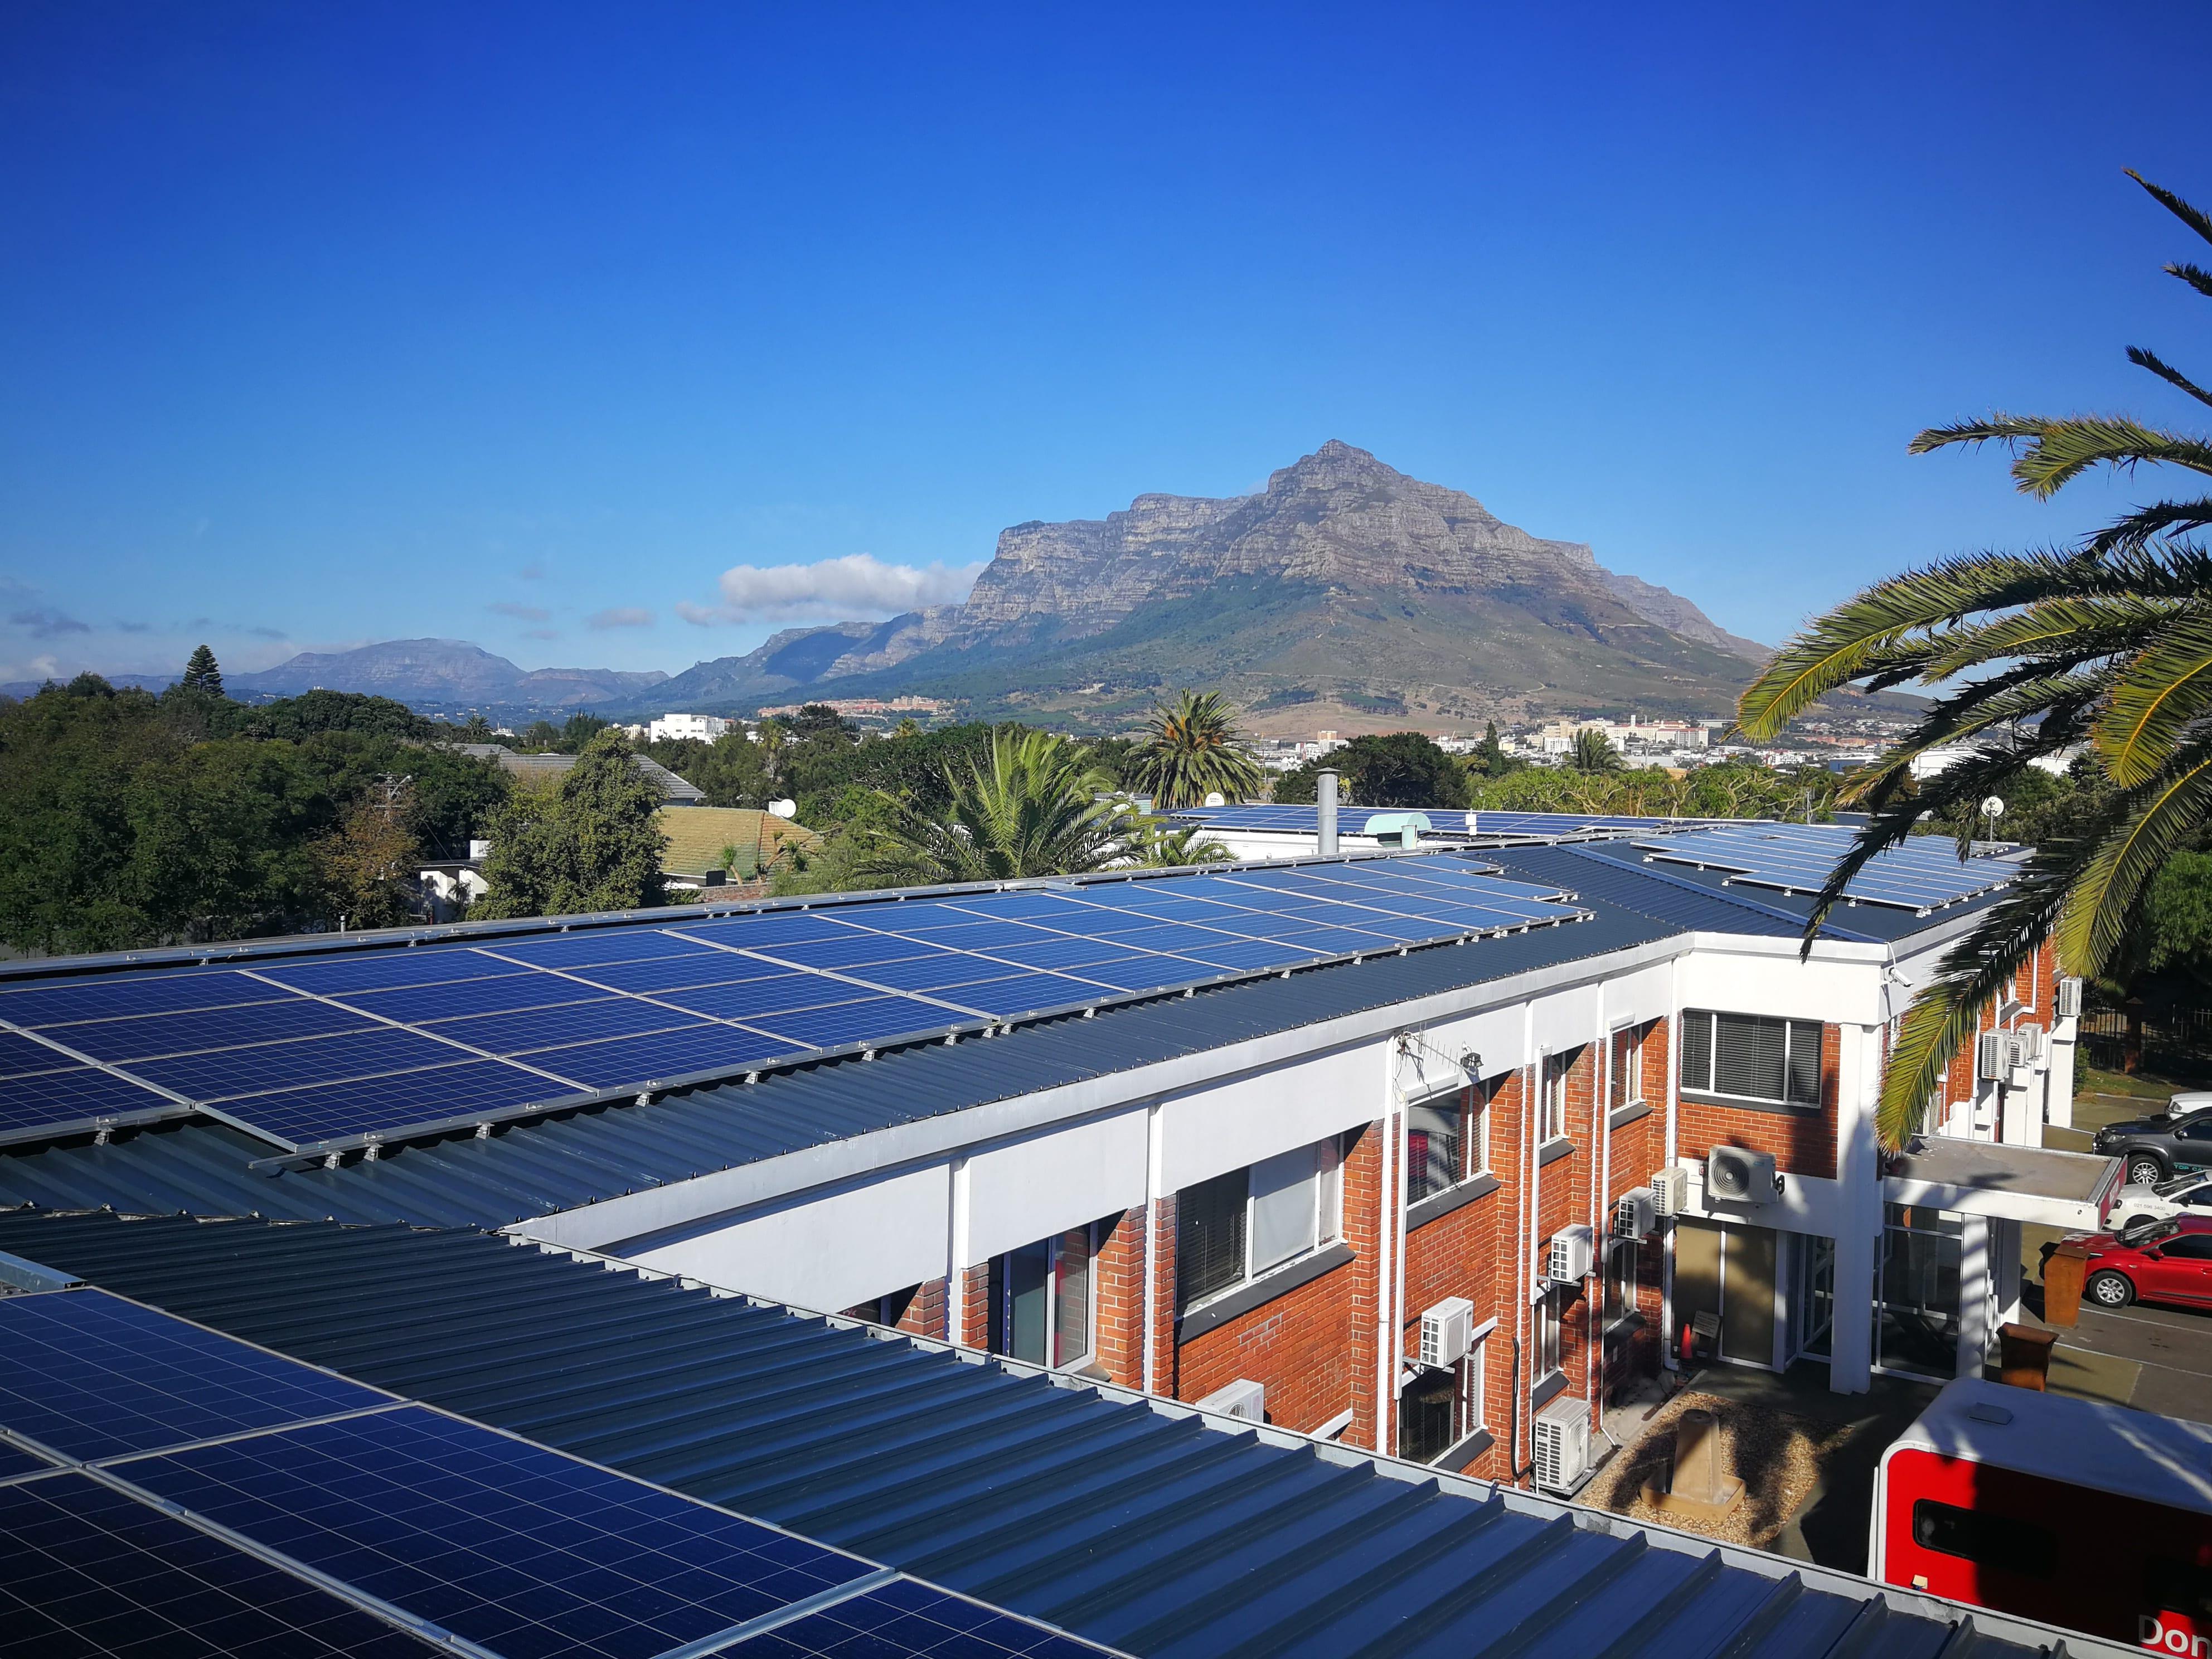 Western Cape Blood Service solar PV system